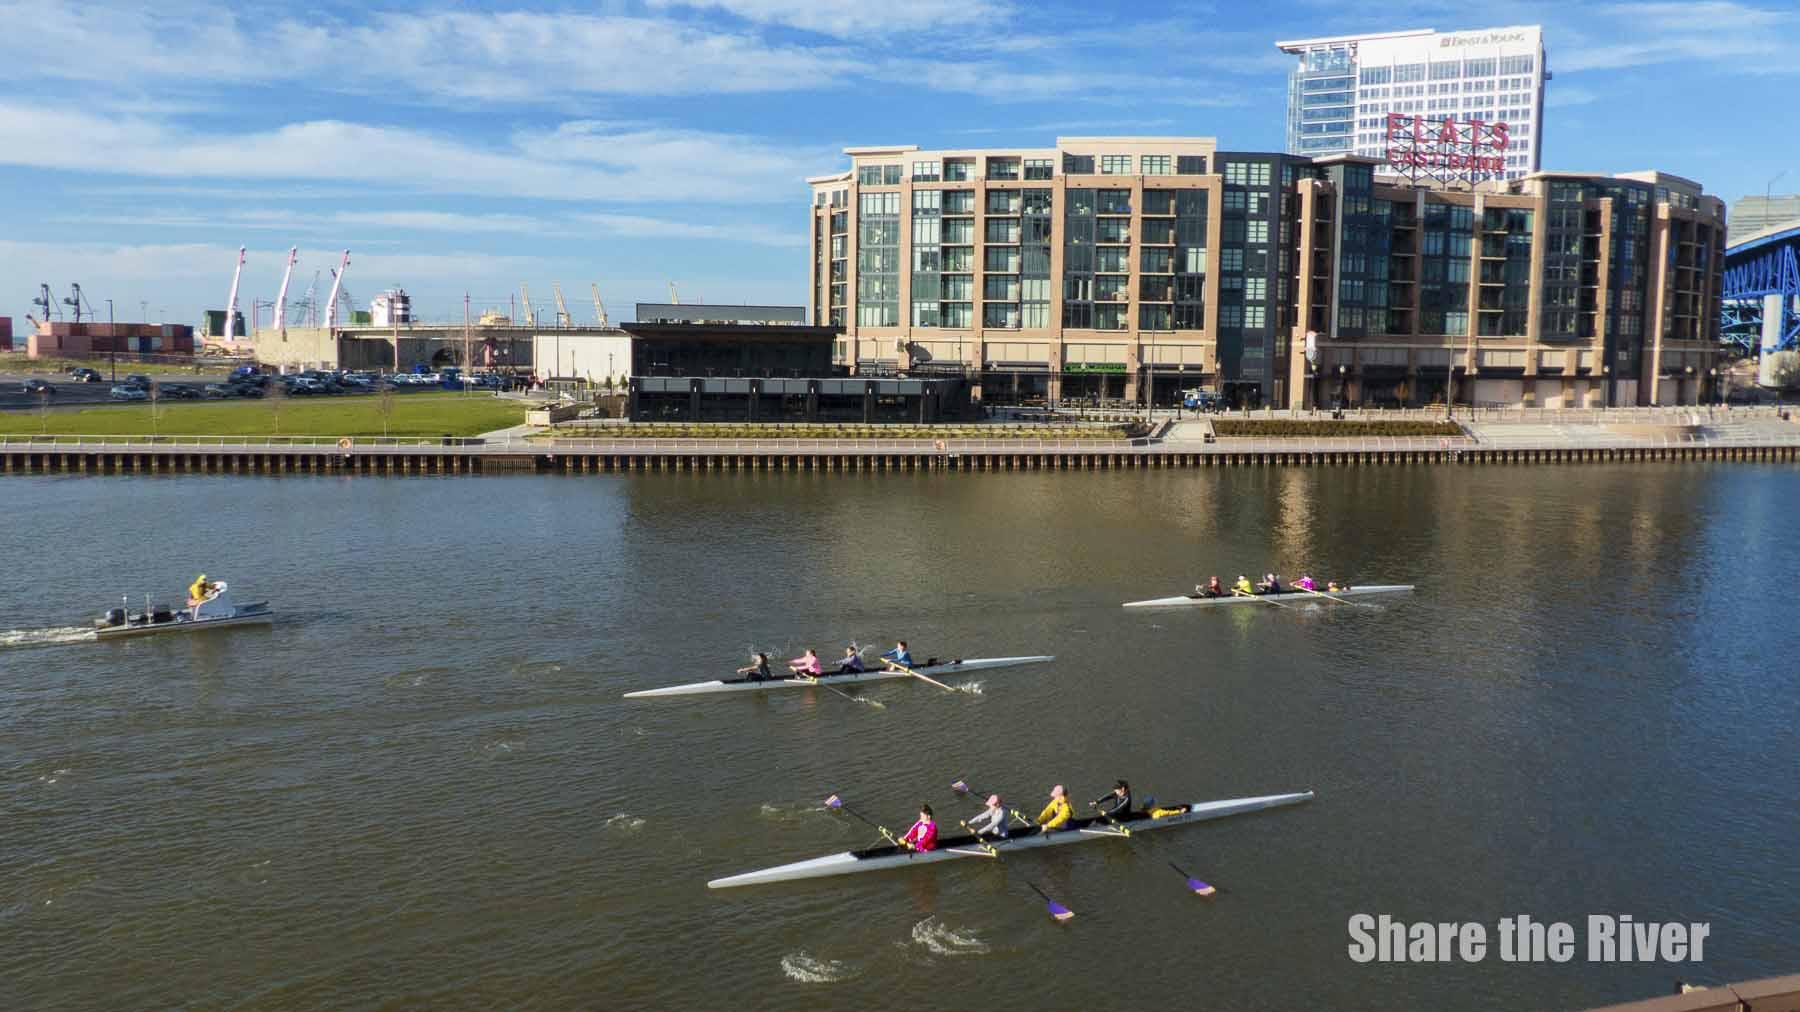 Cuyahoga River - April 2016